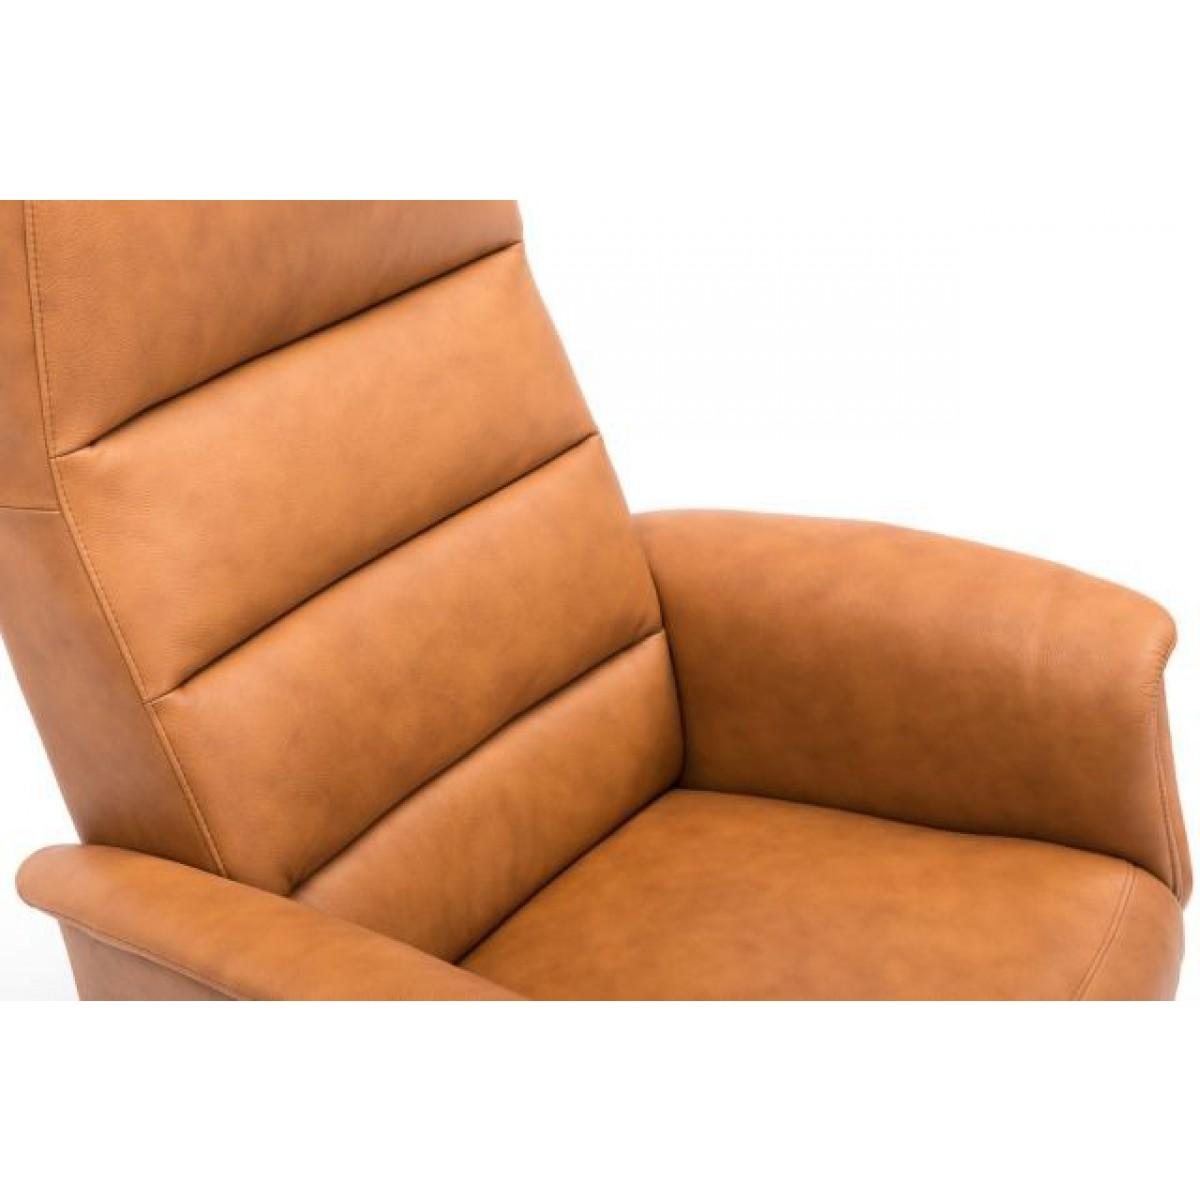 dixon-draaifauteuil-relax-fauteuil-hjort-knudsen-semi-analin-leer-detail